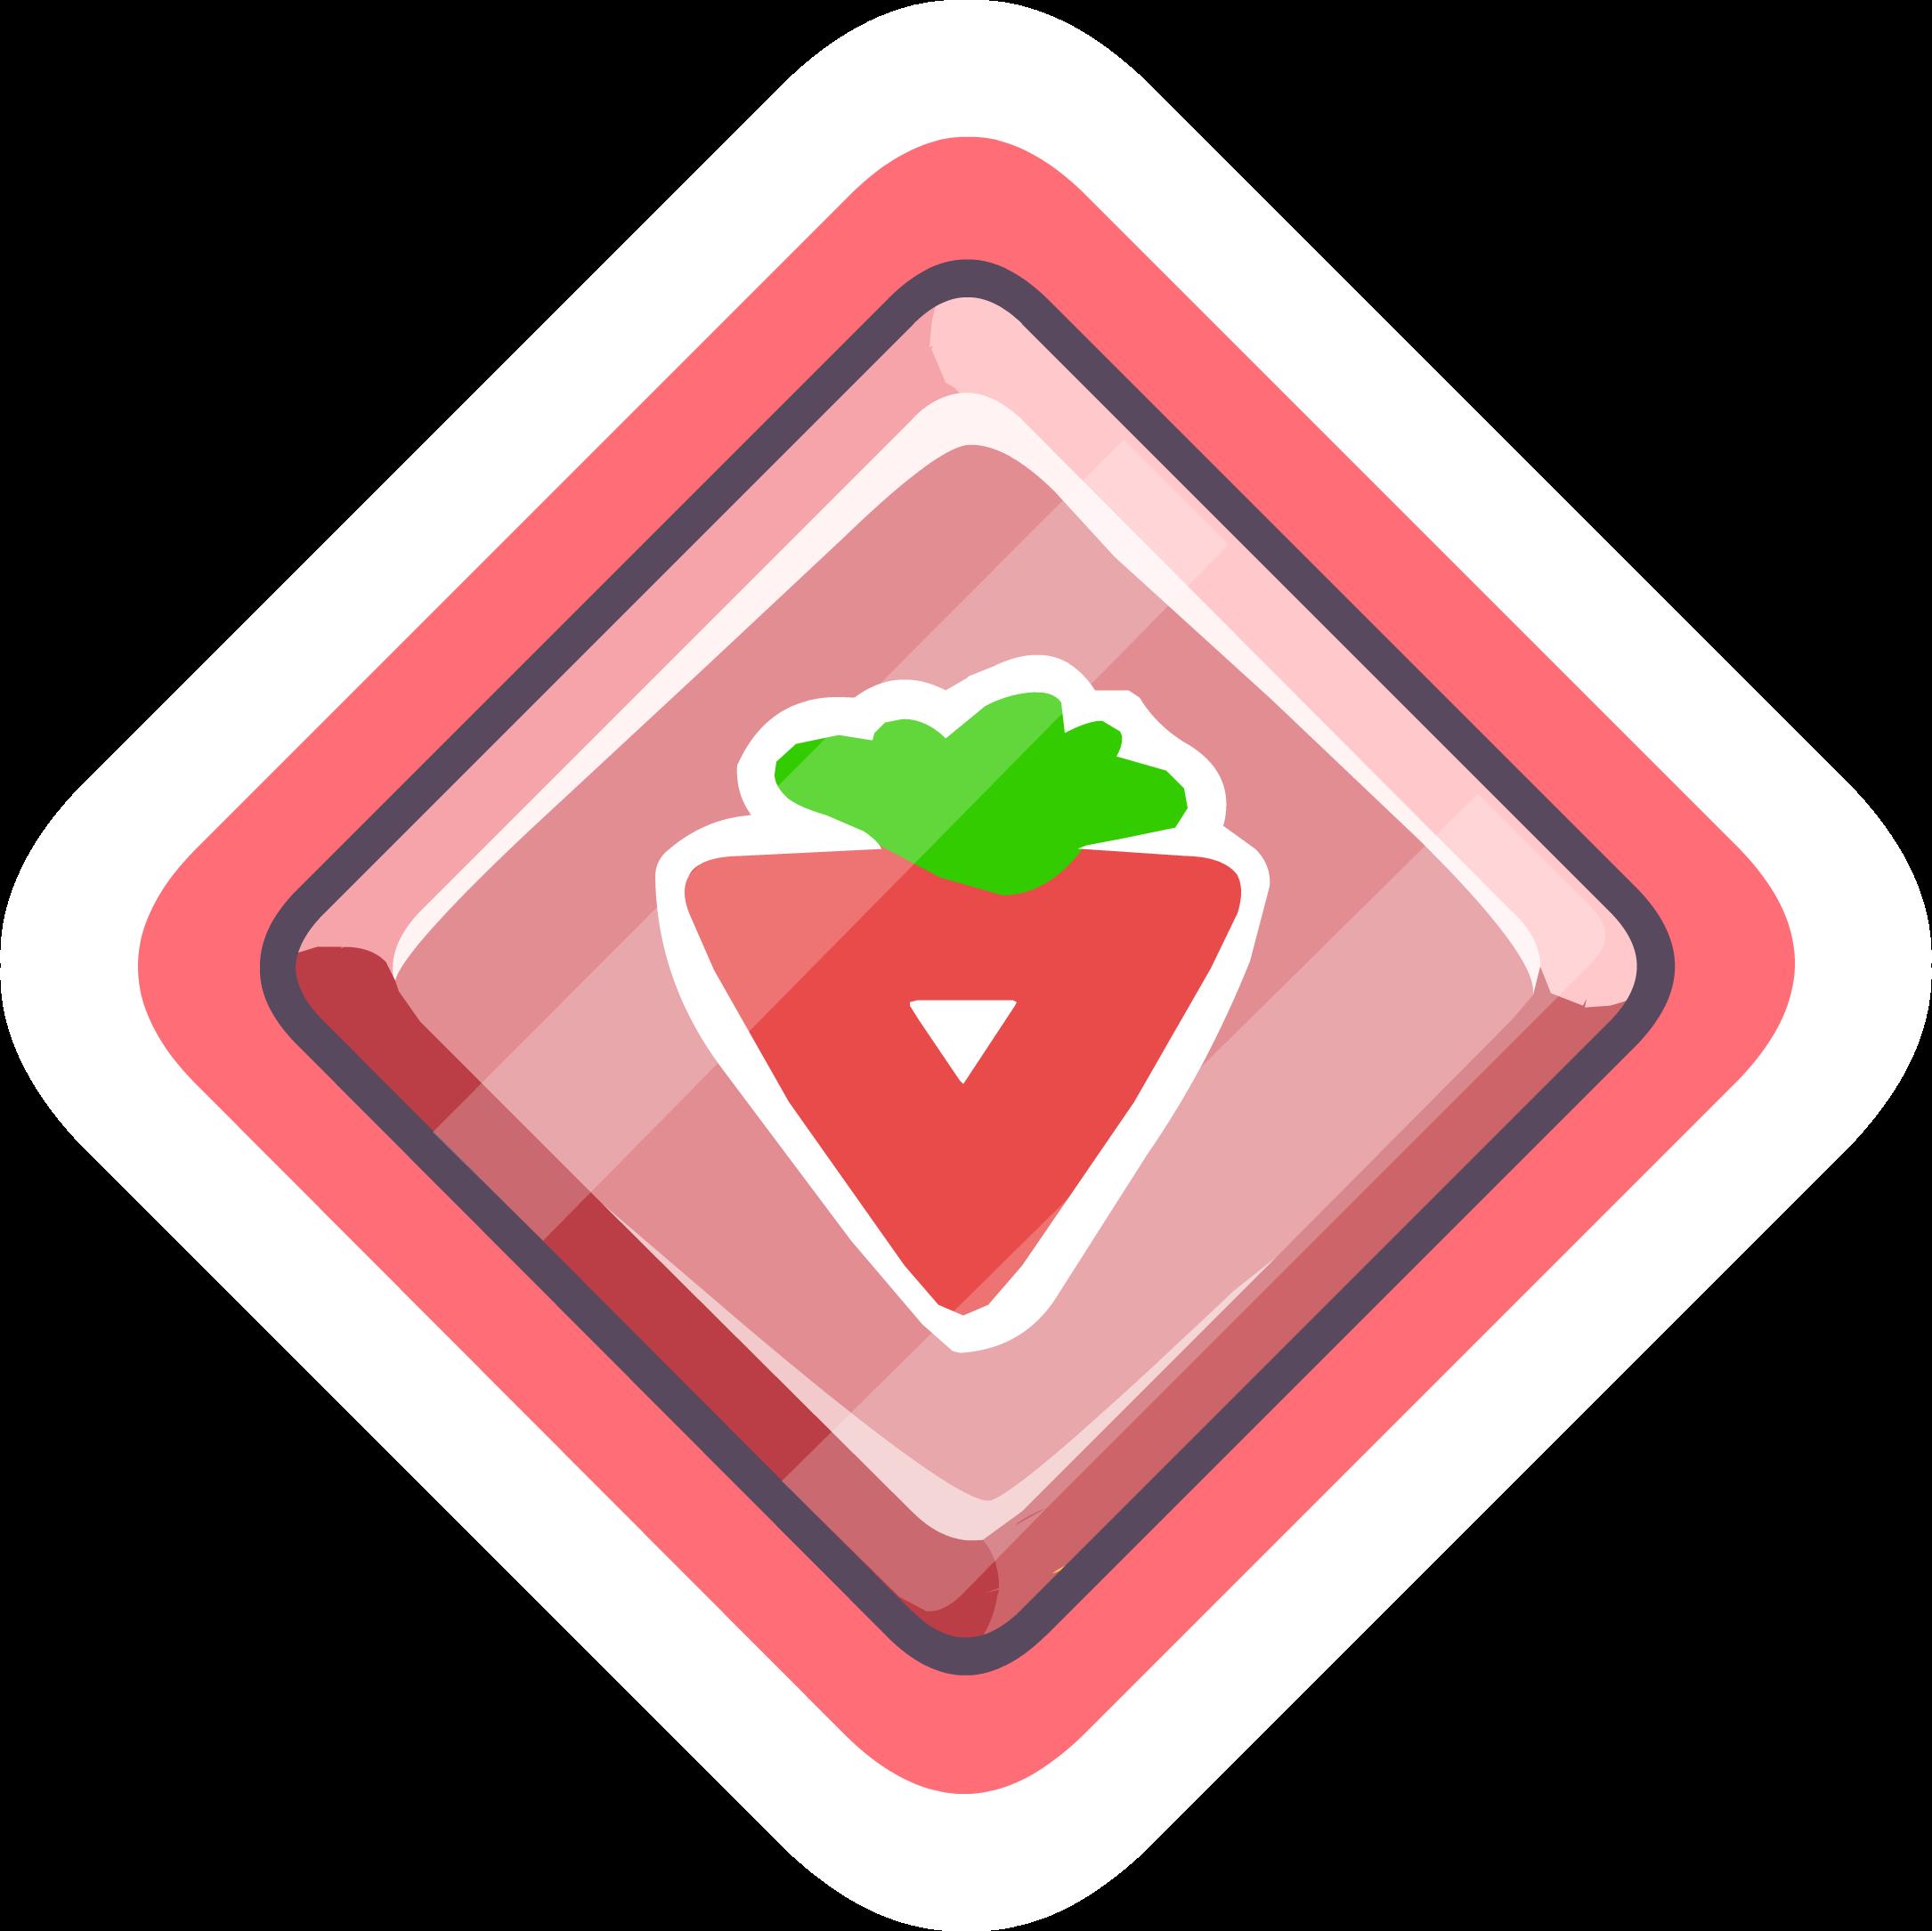 Pin de Puffito Rojo